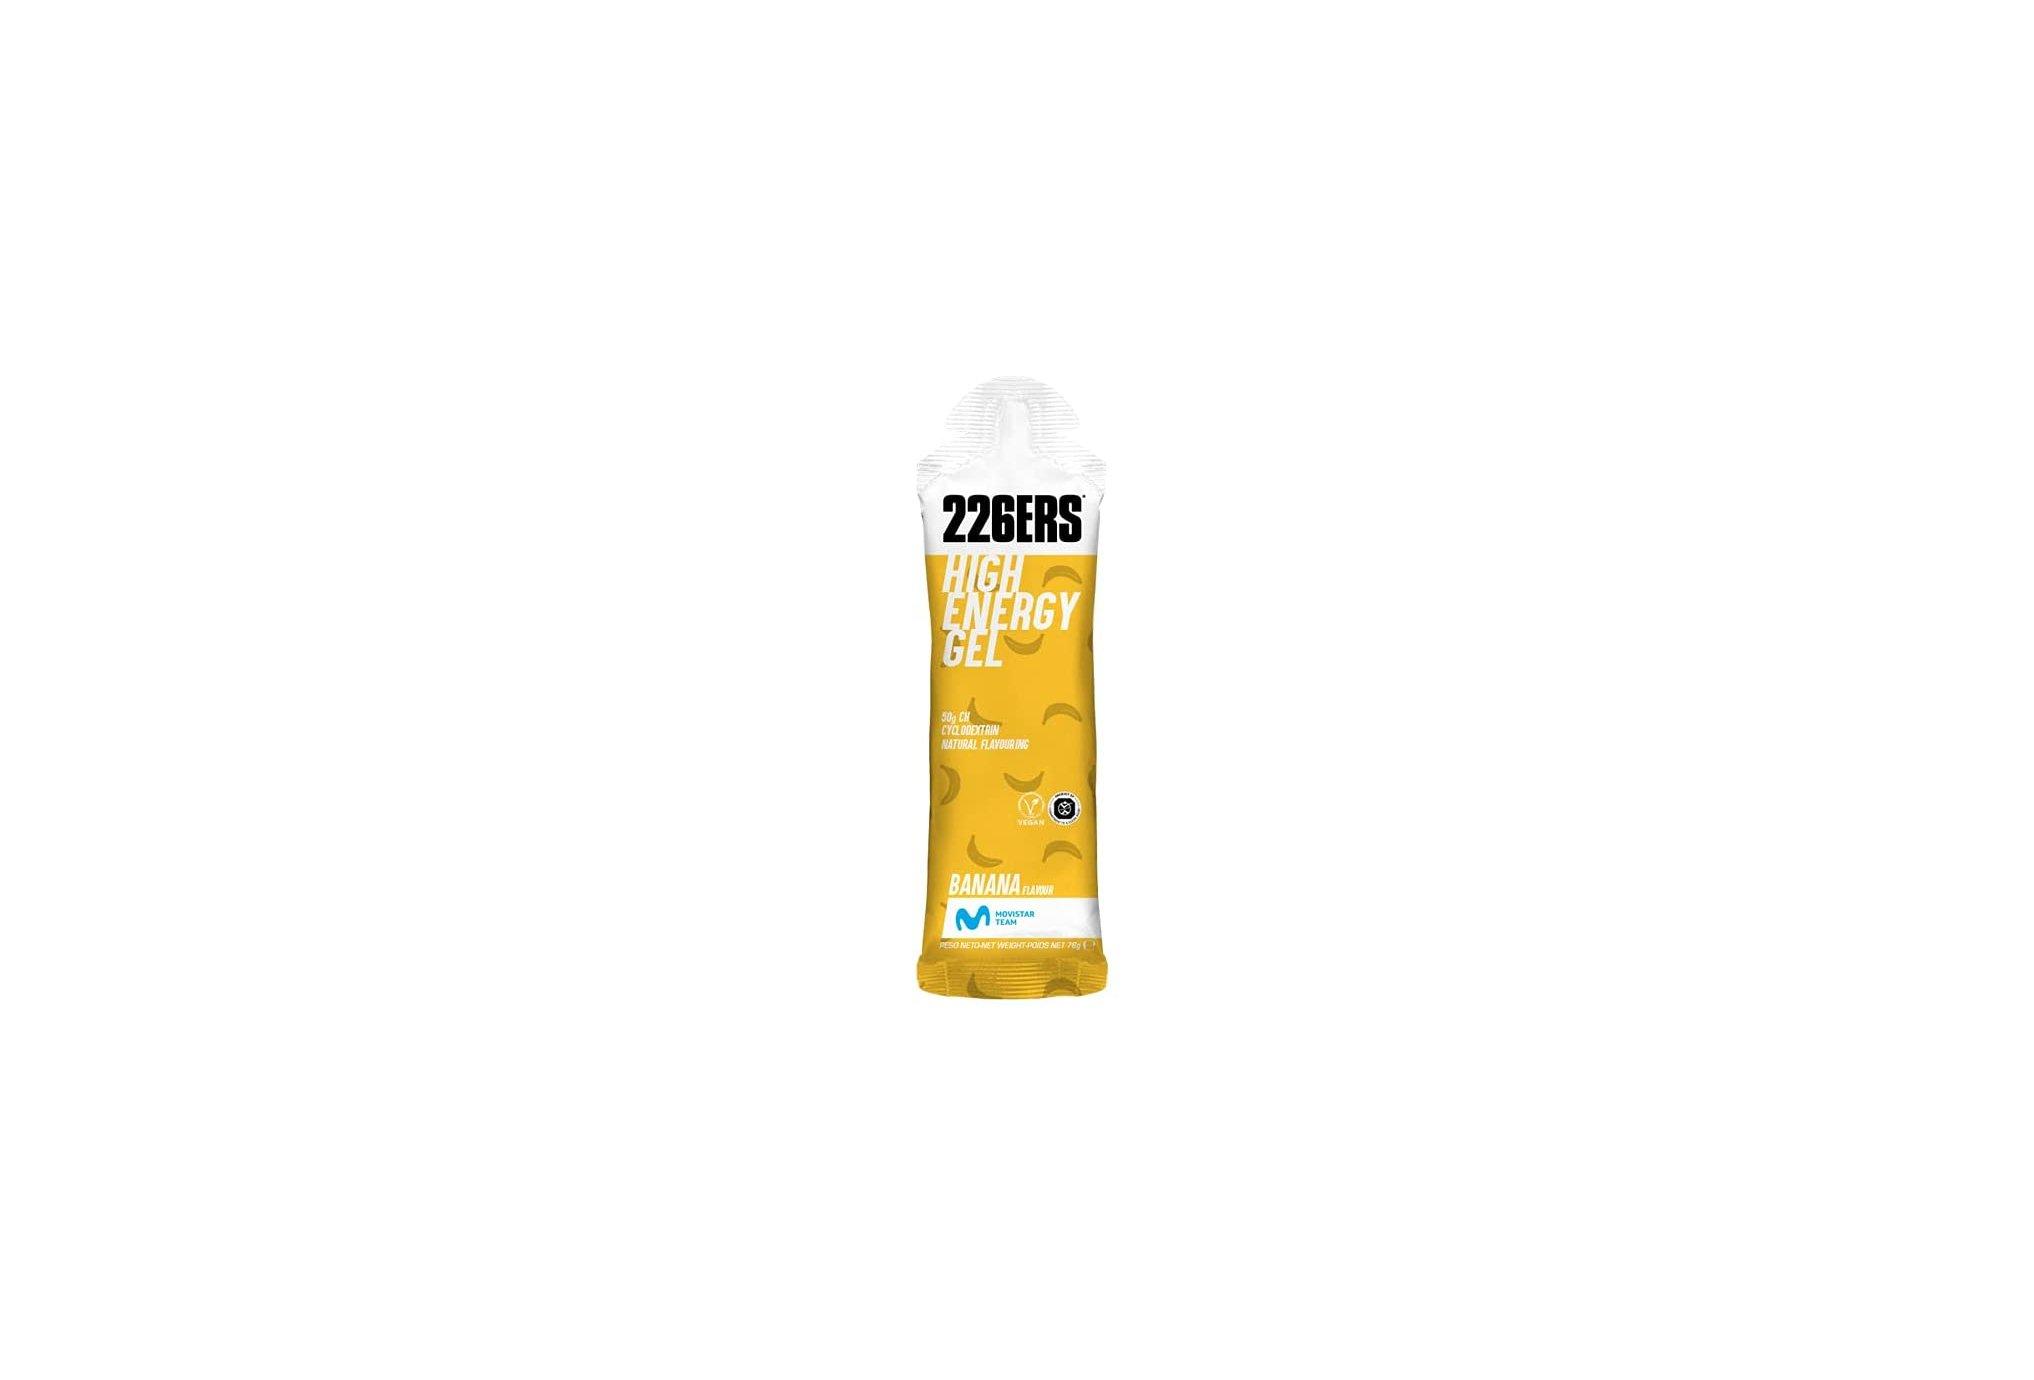 226ers High Energy Gel - Banane Diététique Gels